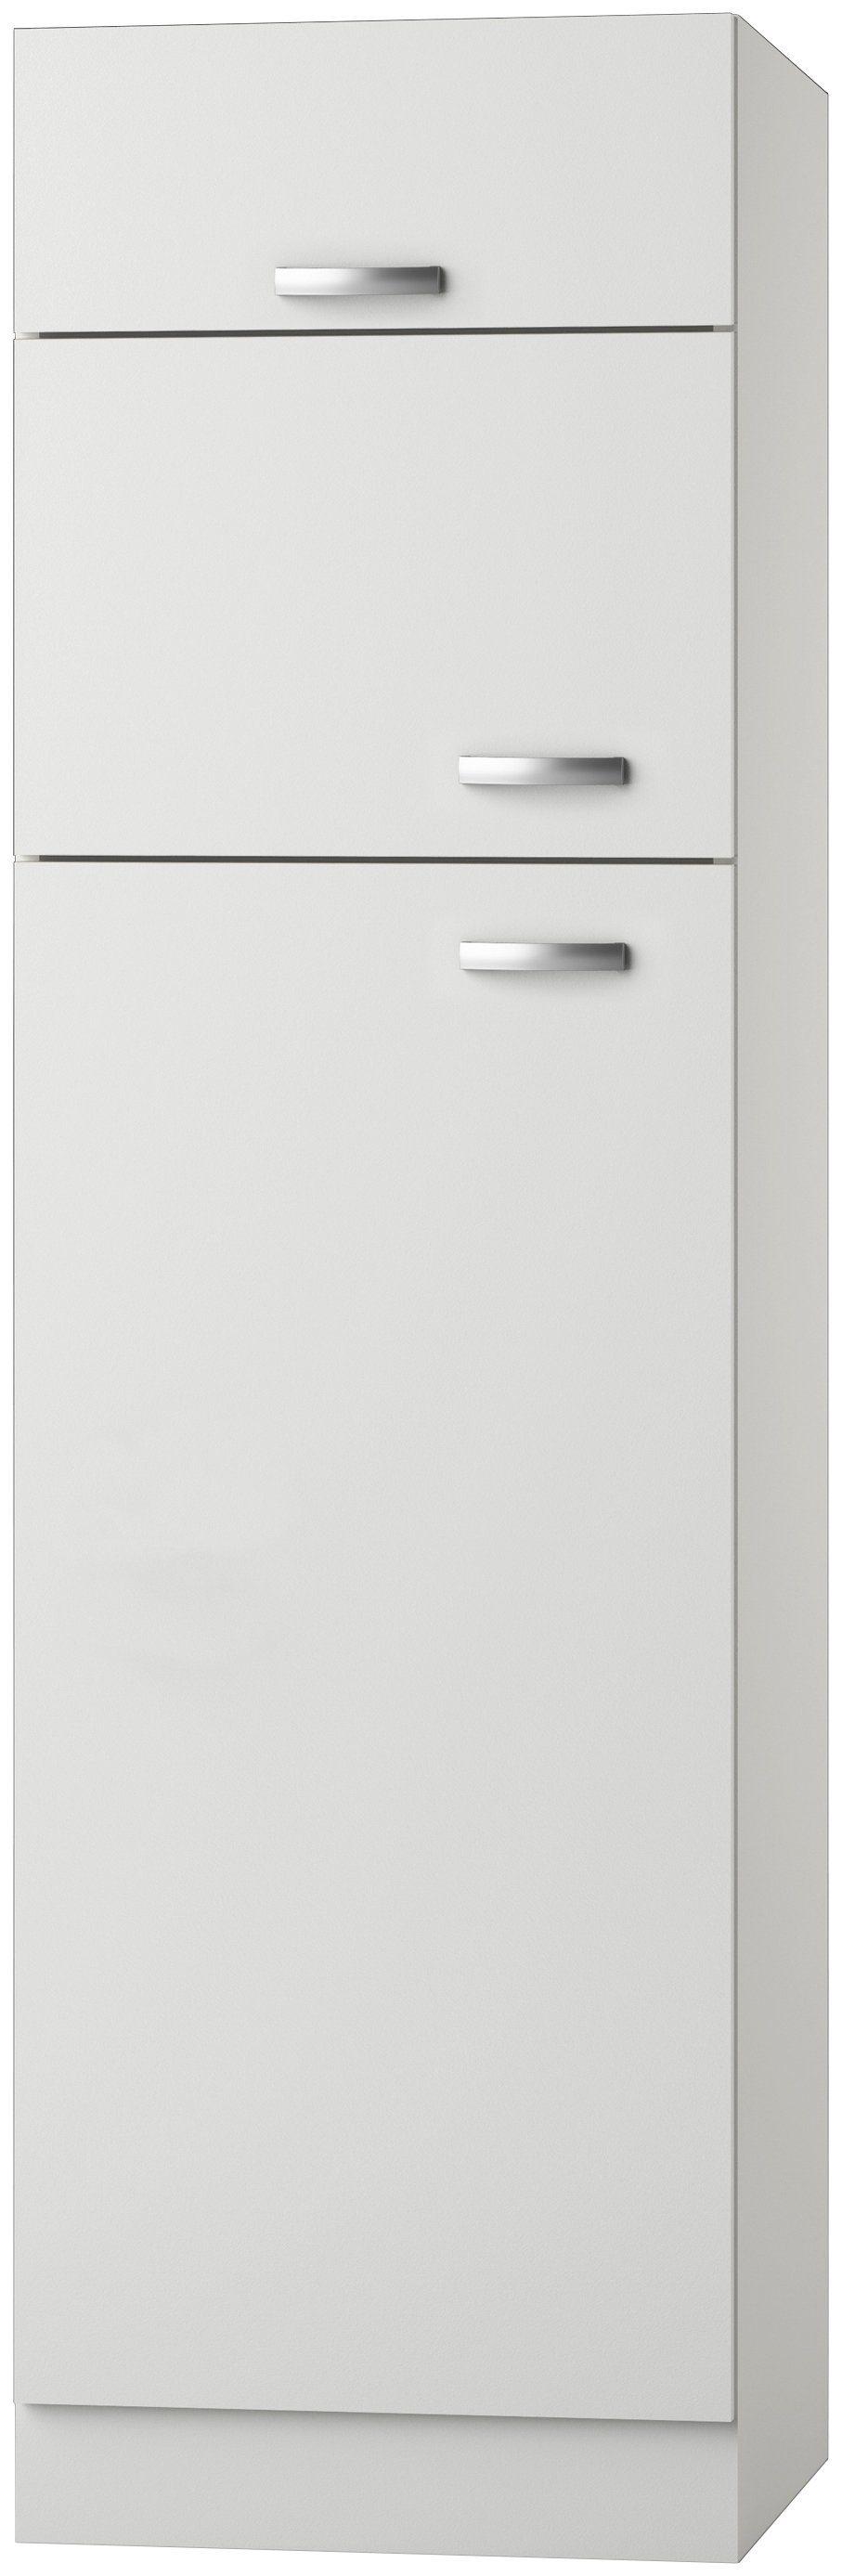 Optifit Kühlumbauschrank »Lagos, Höhe 206,8 cm«